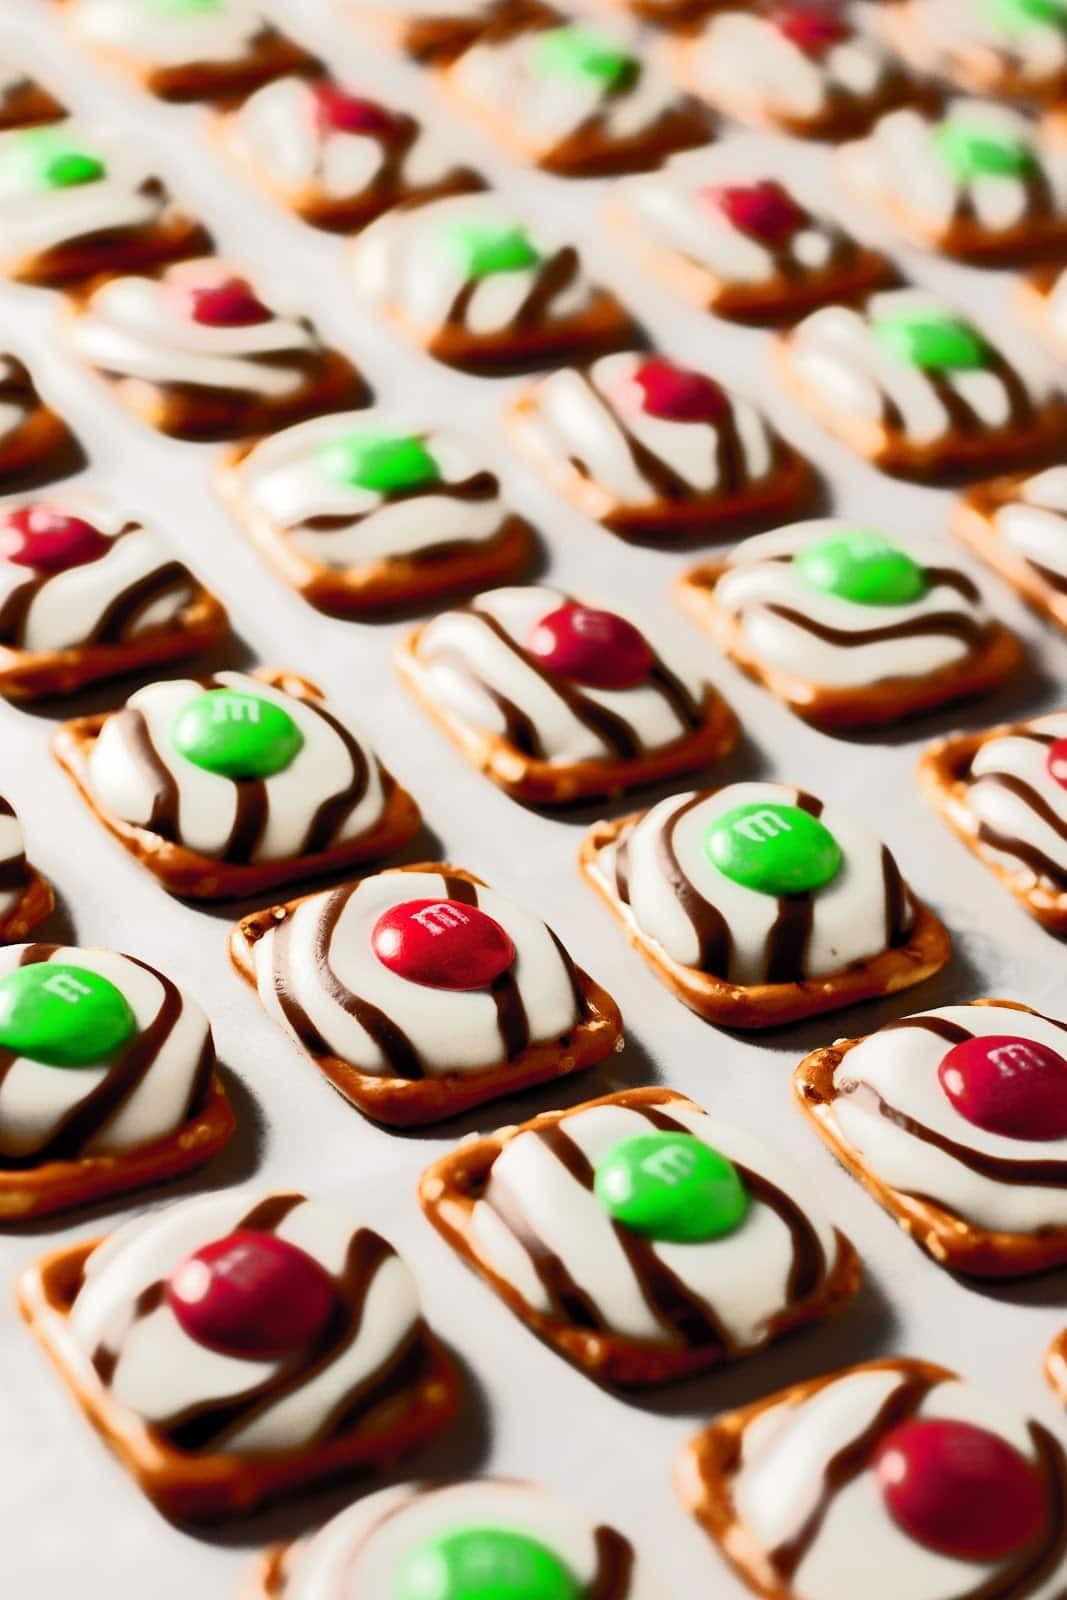 Christmas Chocolate Pretzels  Pretzel M&M Hugs Christmas Style Cooking Classy